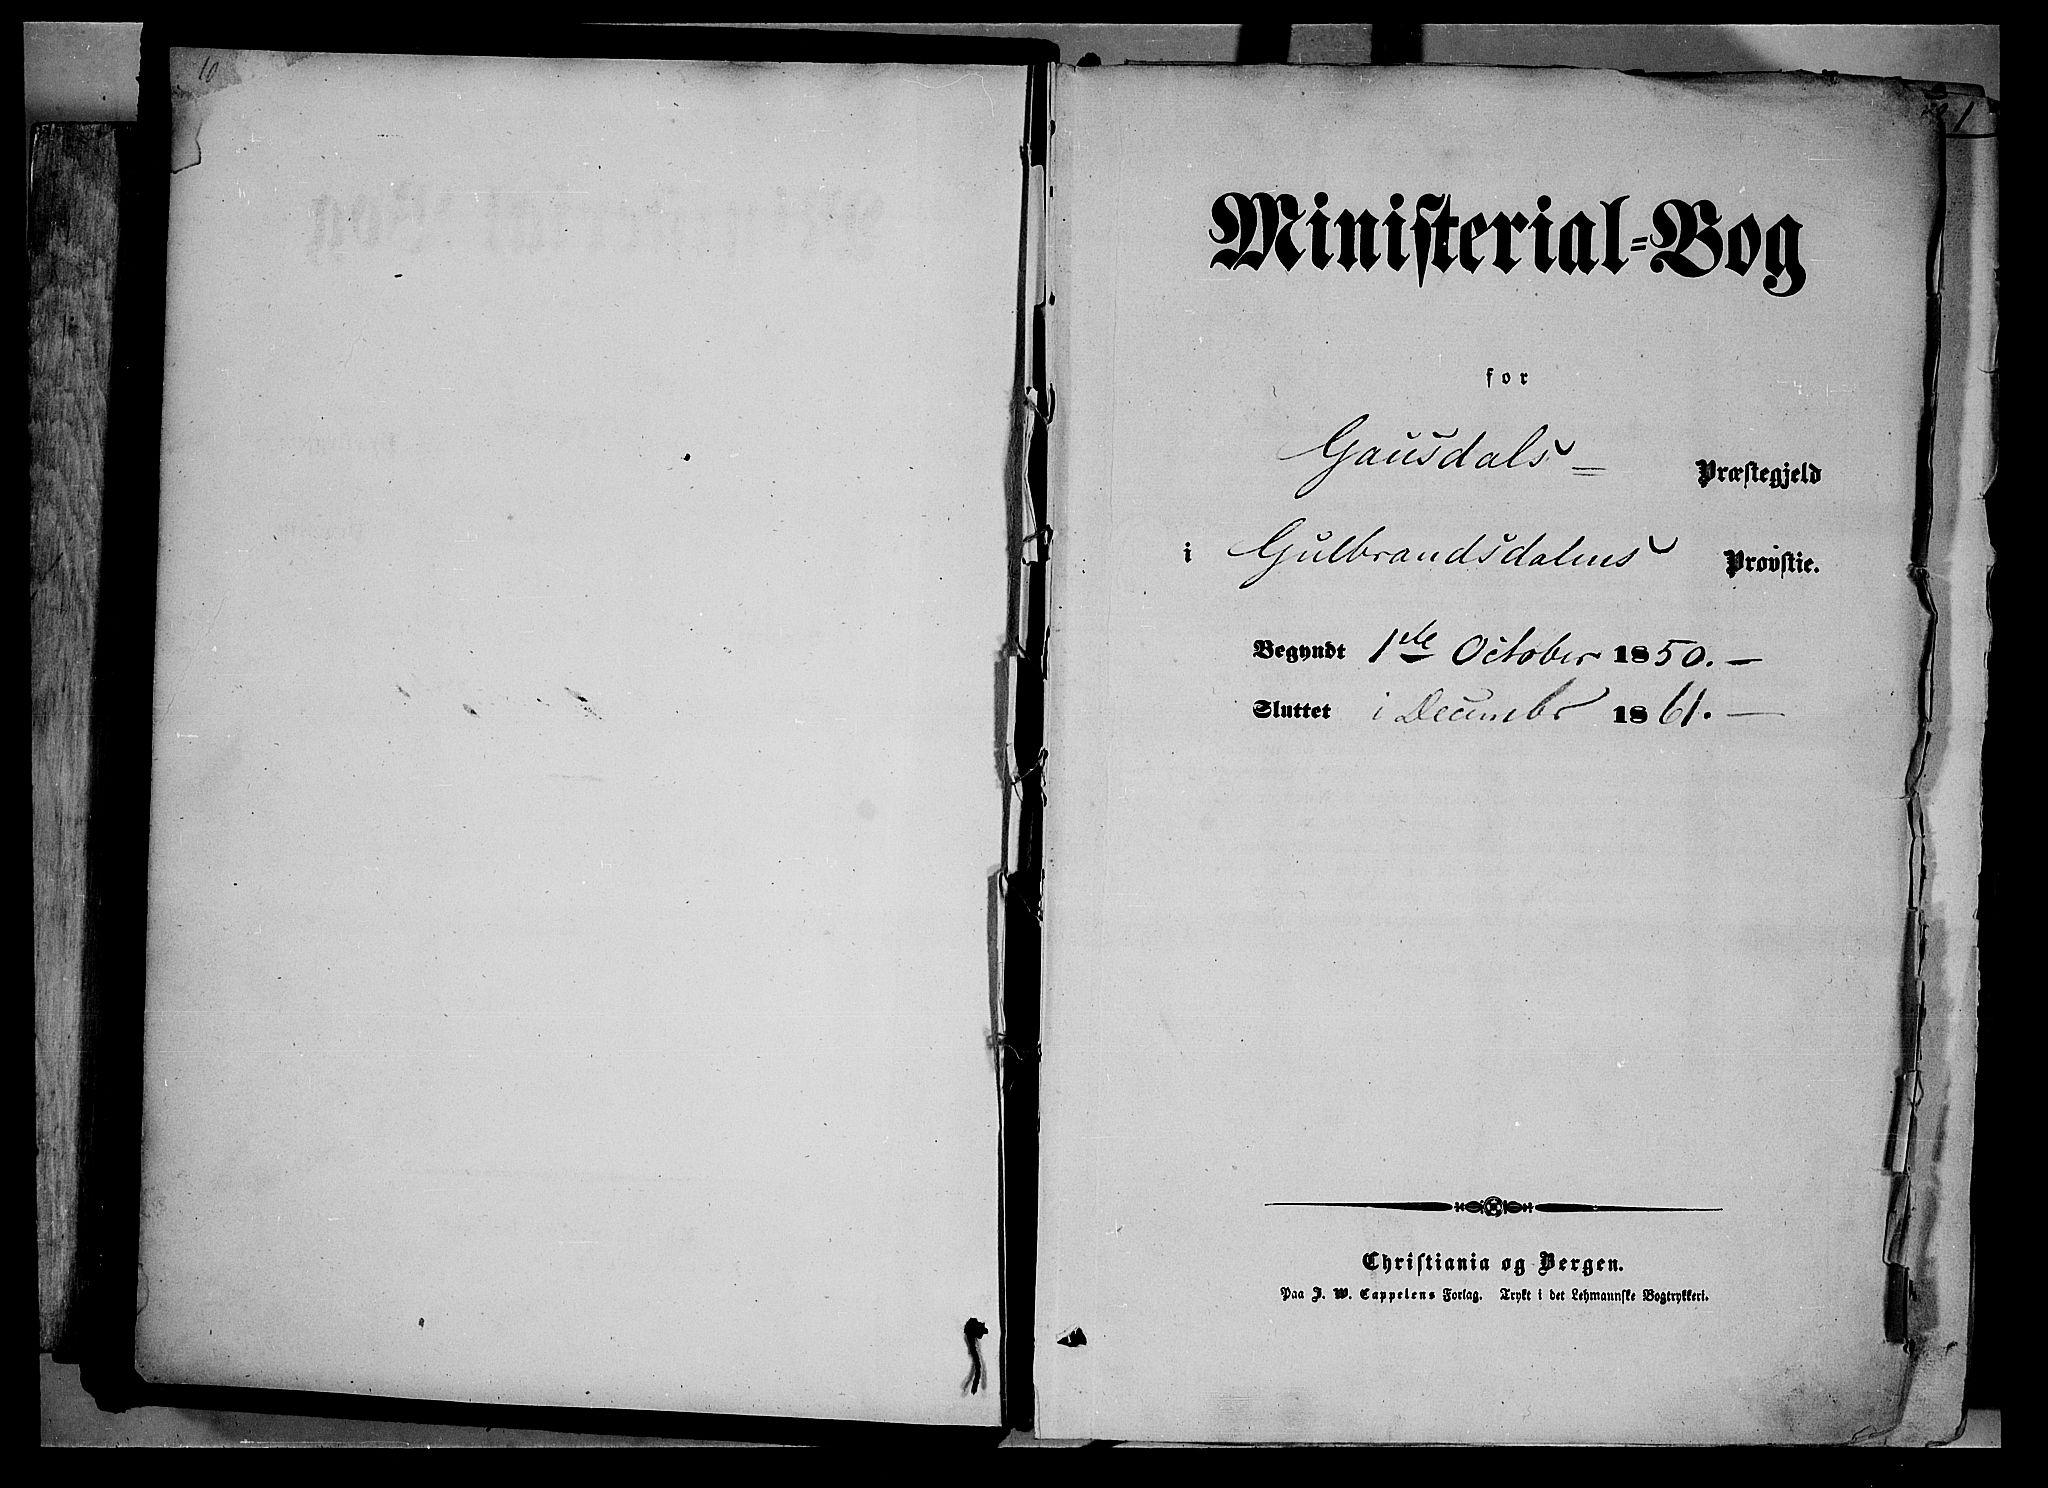 SAH, Gausdal prestekontor, Ministerialbok nr. 8, 1850-1861